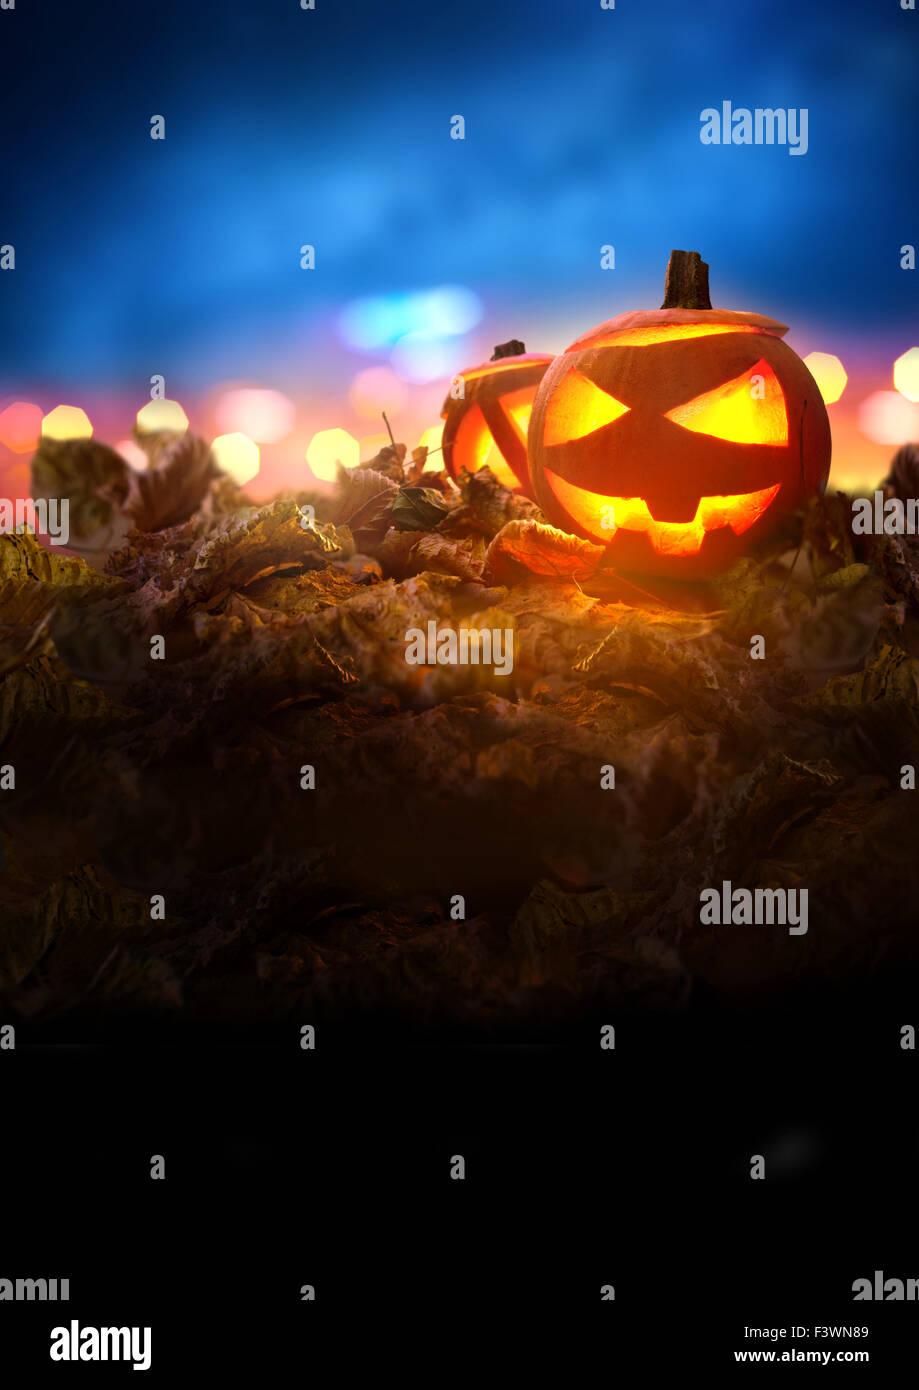 Halloween Night. A Jack O Lantern Pumpkin glowing orange on Halloween evening between autumn leaves. - Stock Image